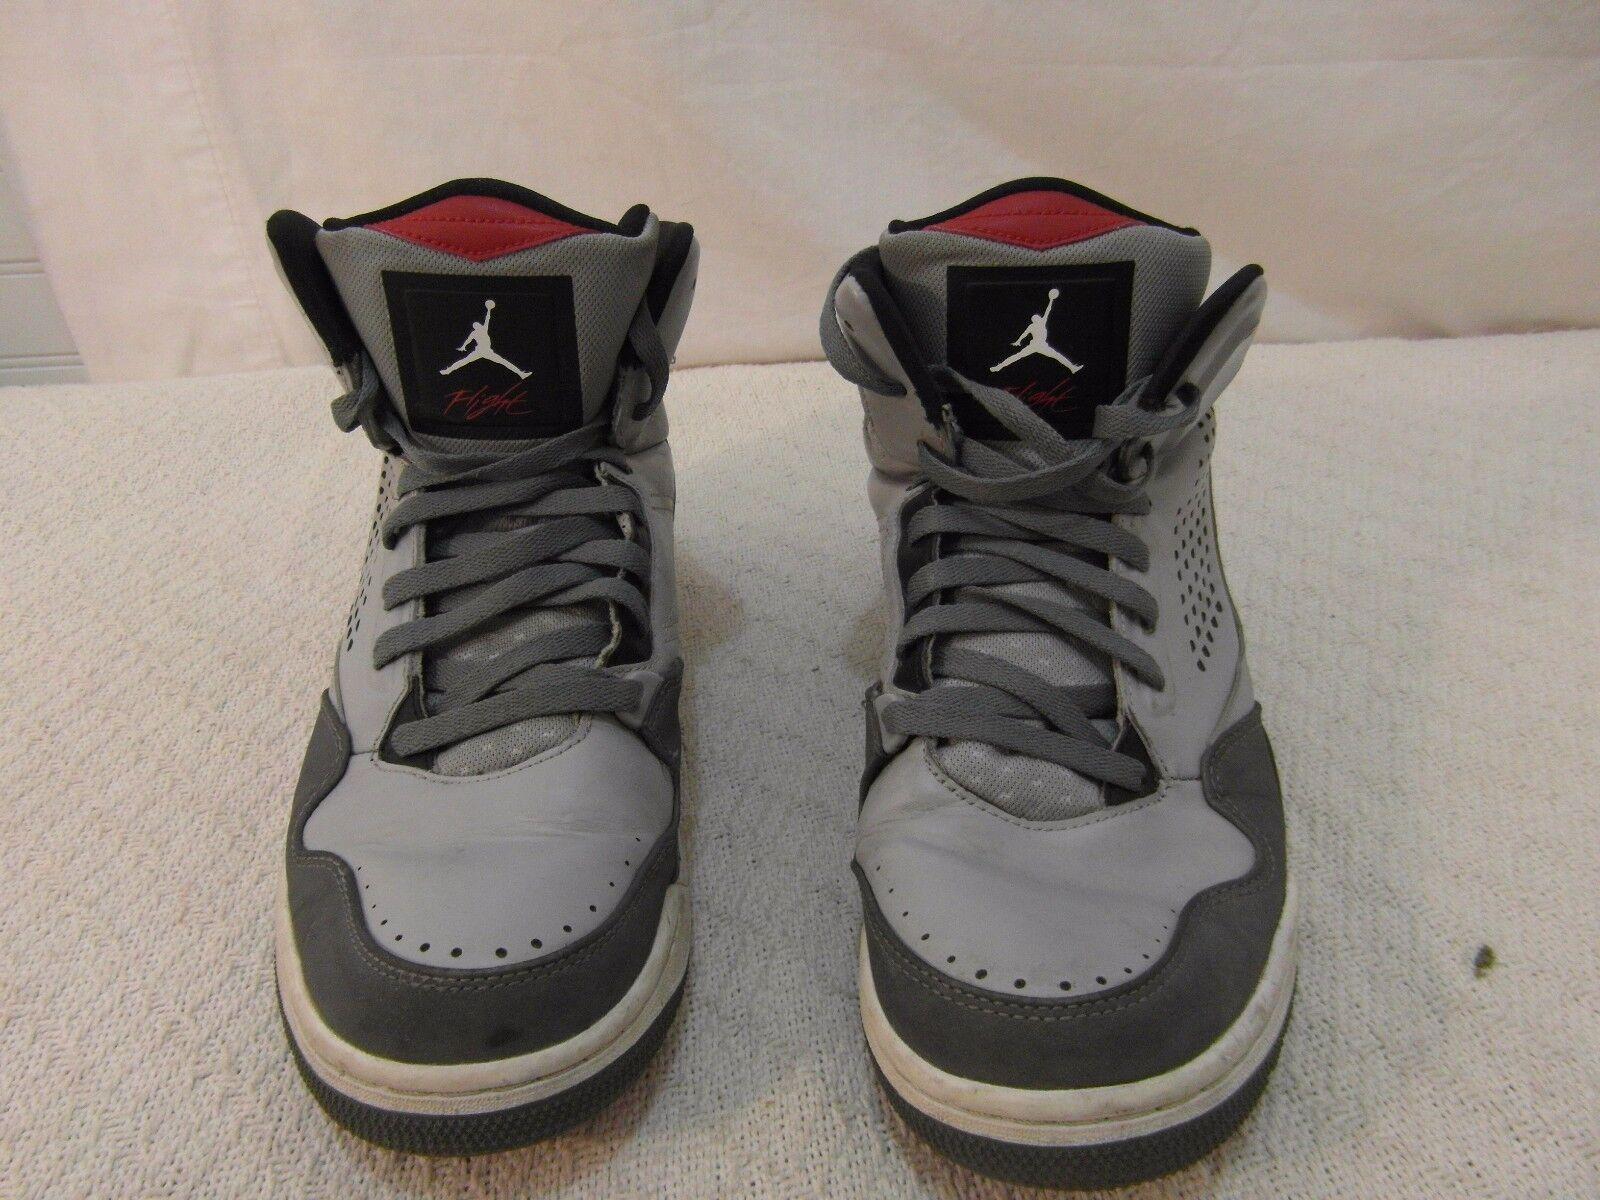 VERY RARE Men's Nike Air Jordan Flight Gray Shoes Black 10.5 Basketball Tennis Shoes Gray 278373